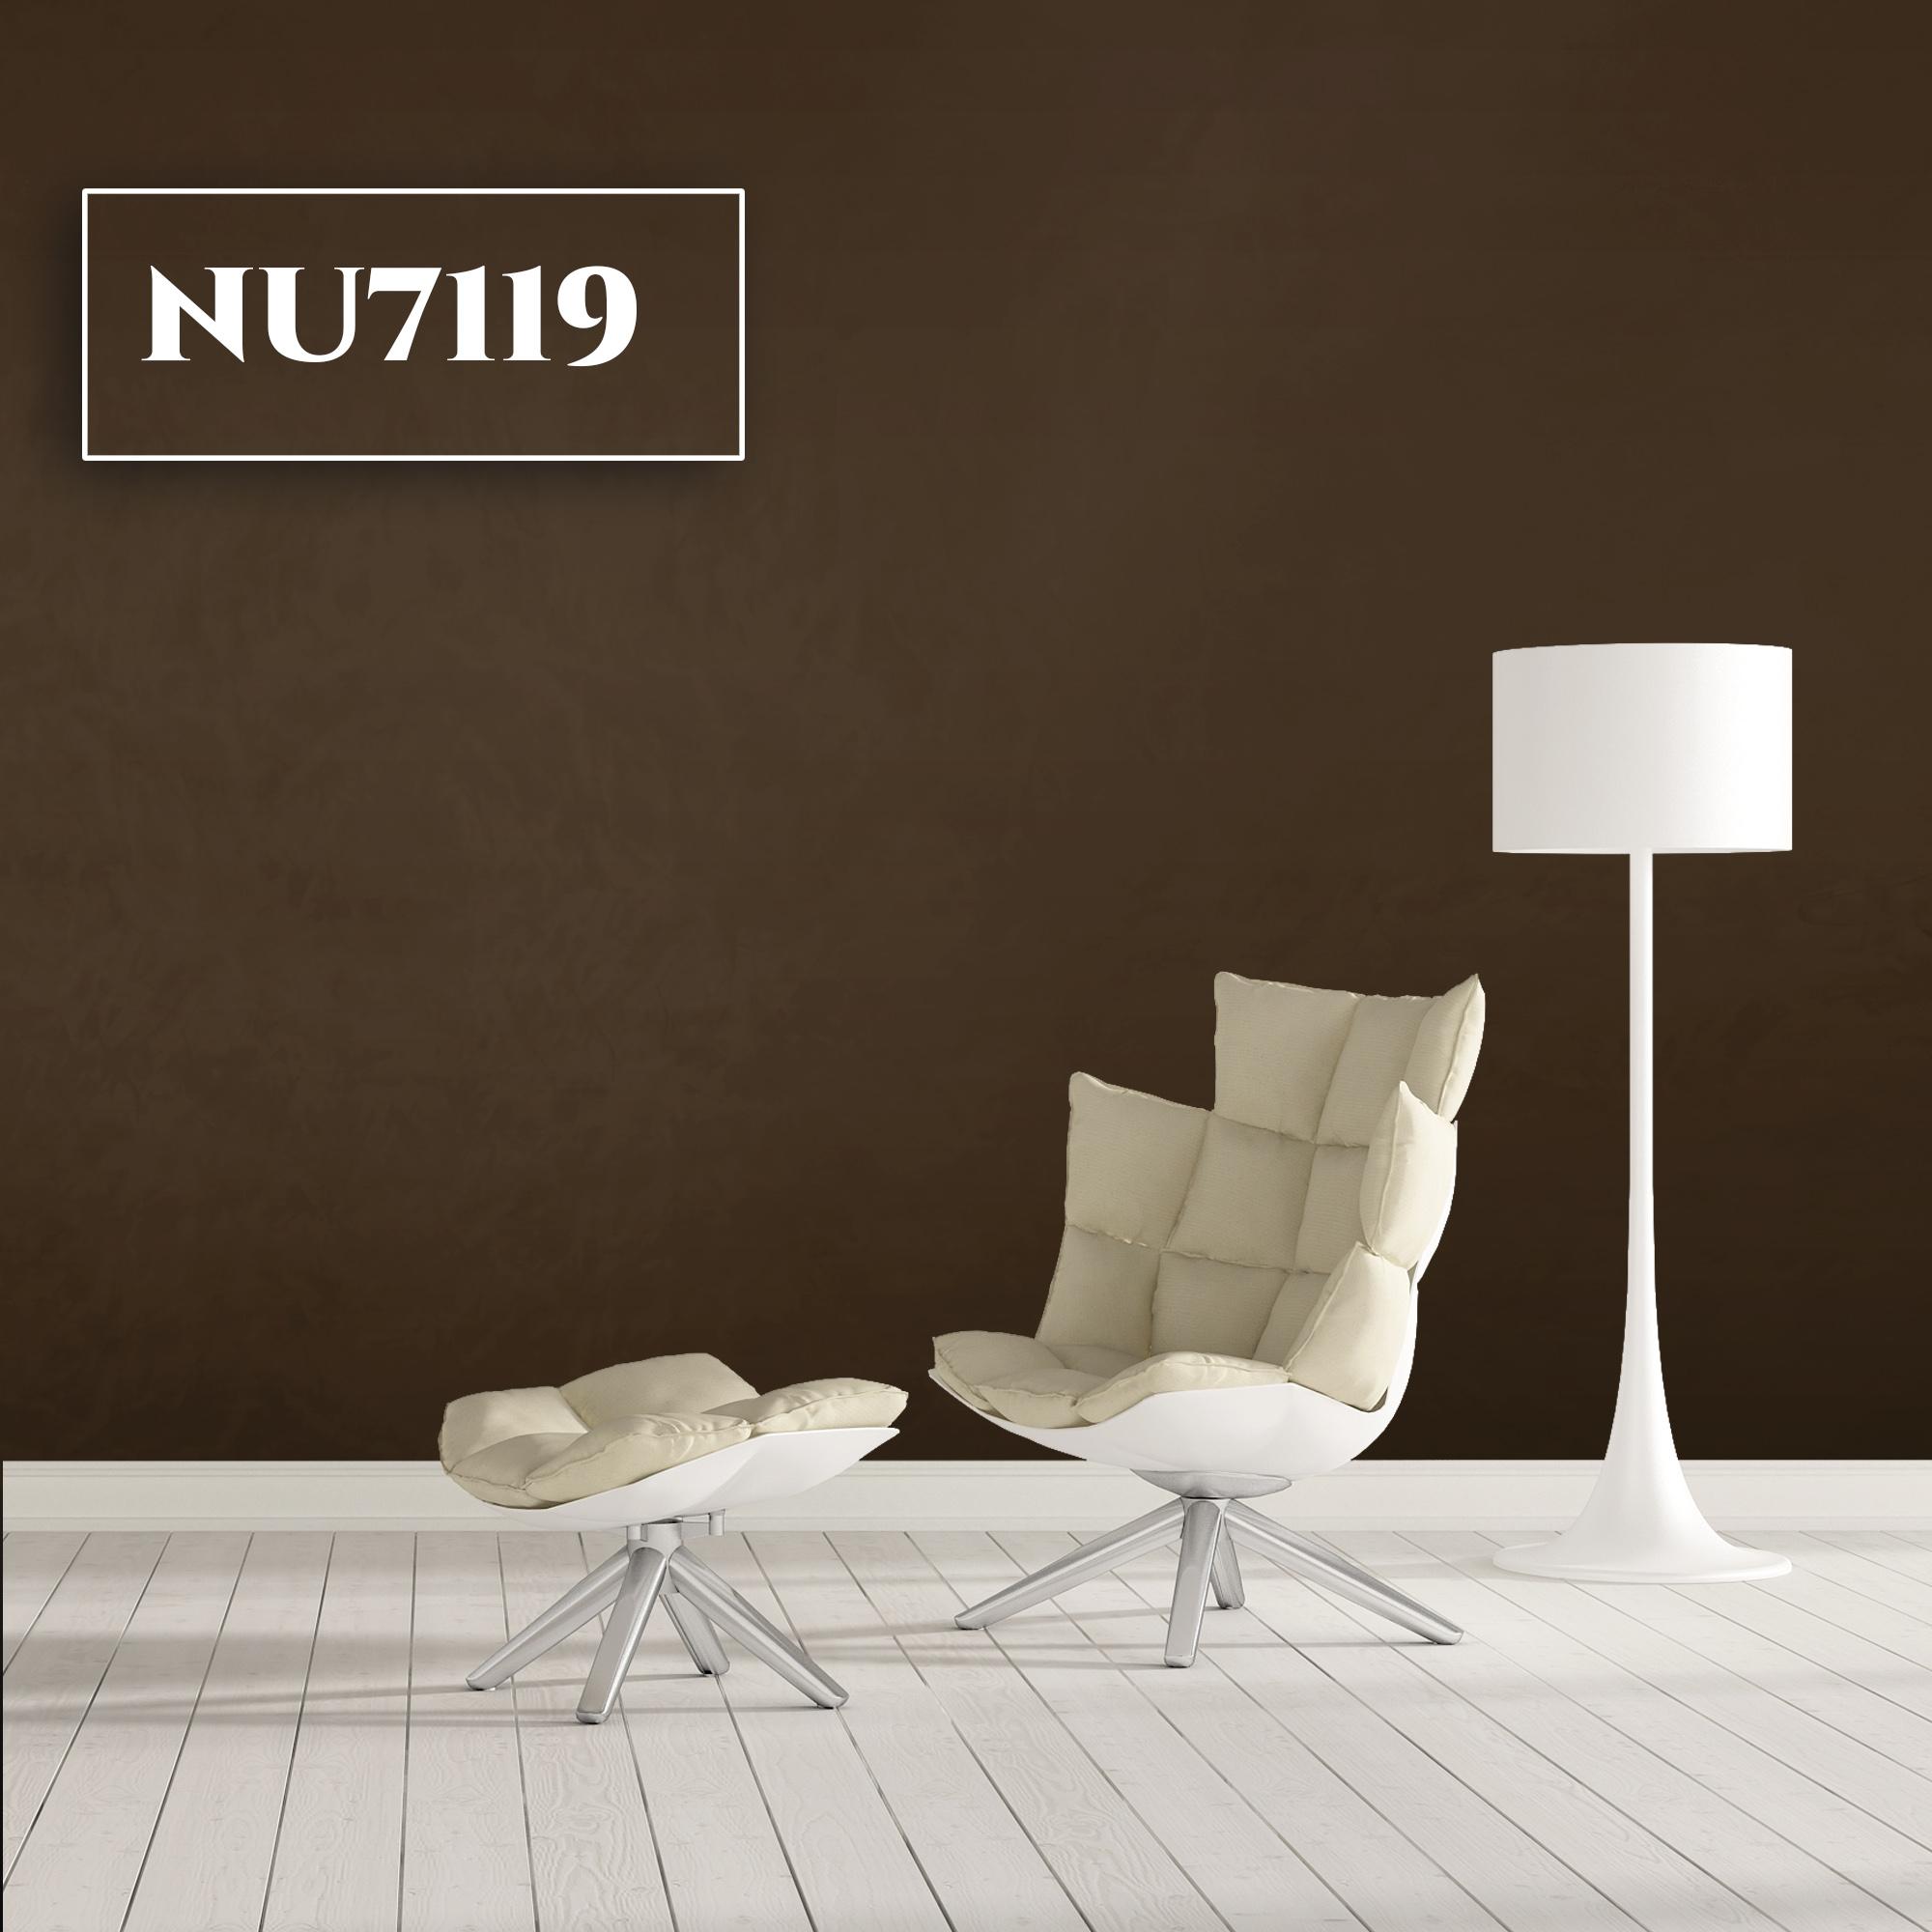 NU7119